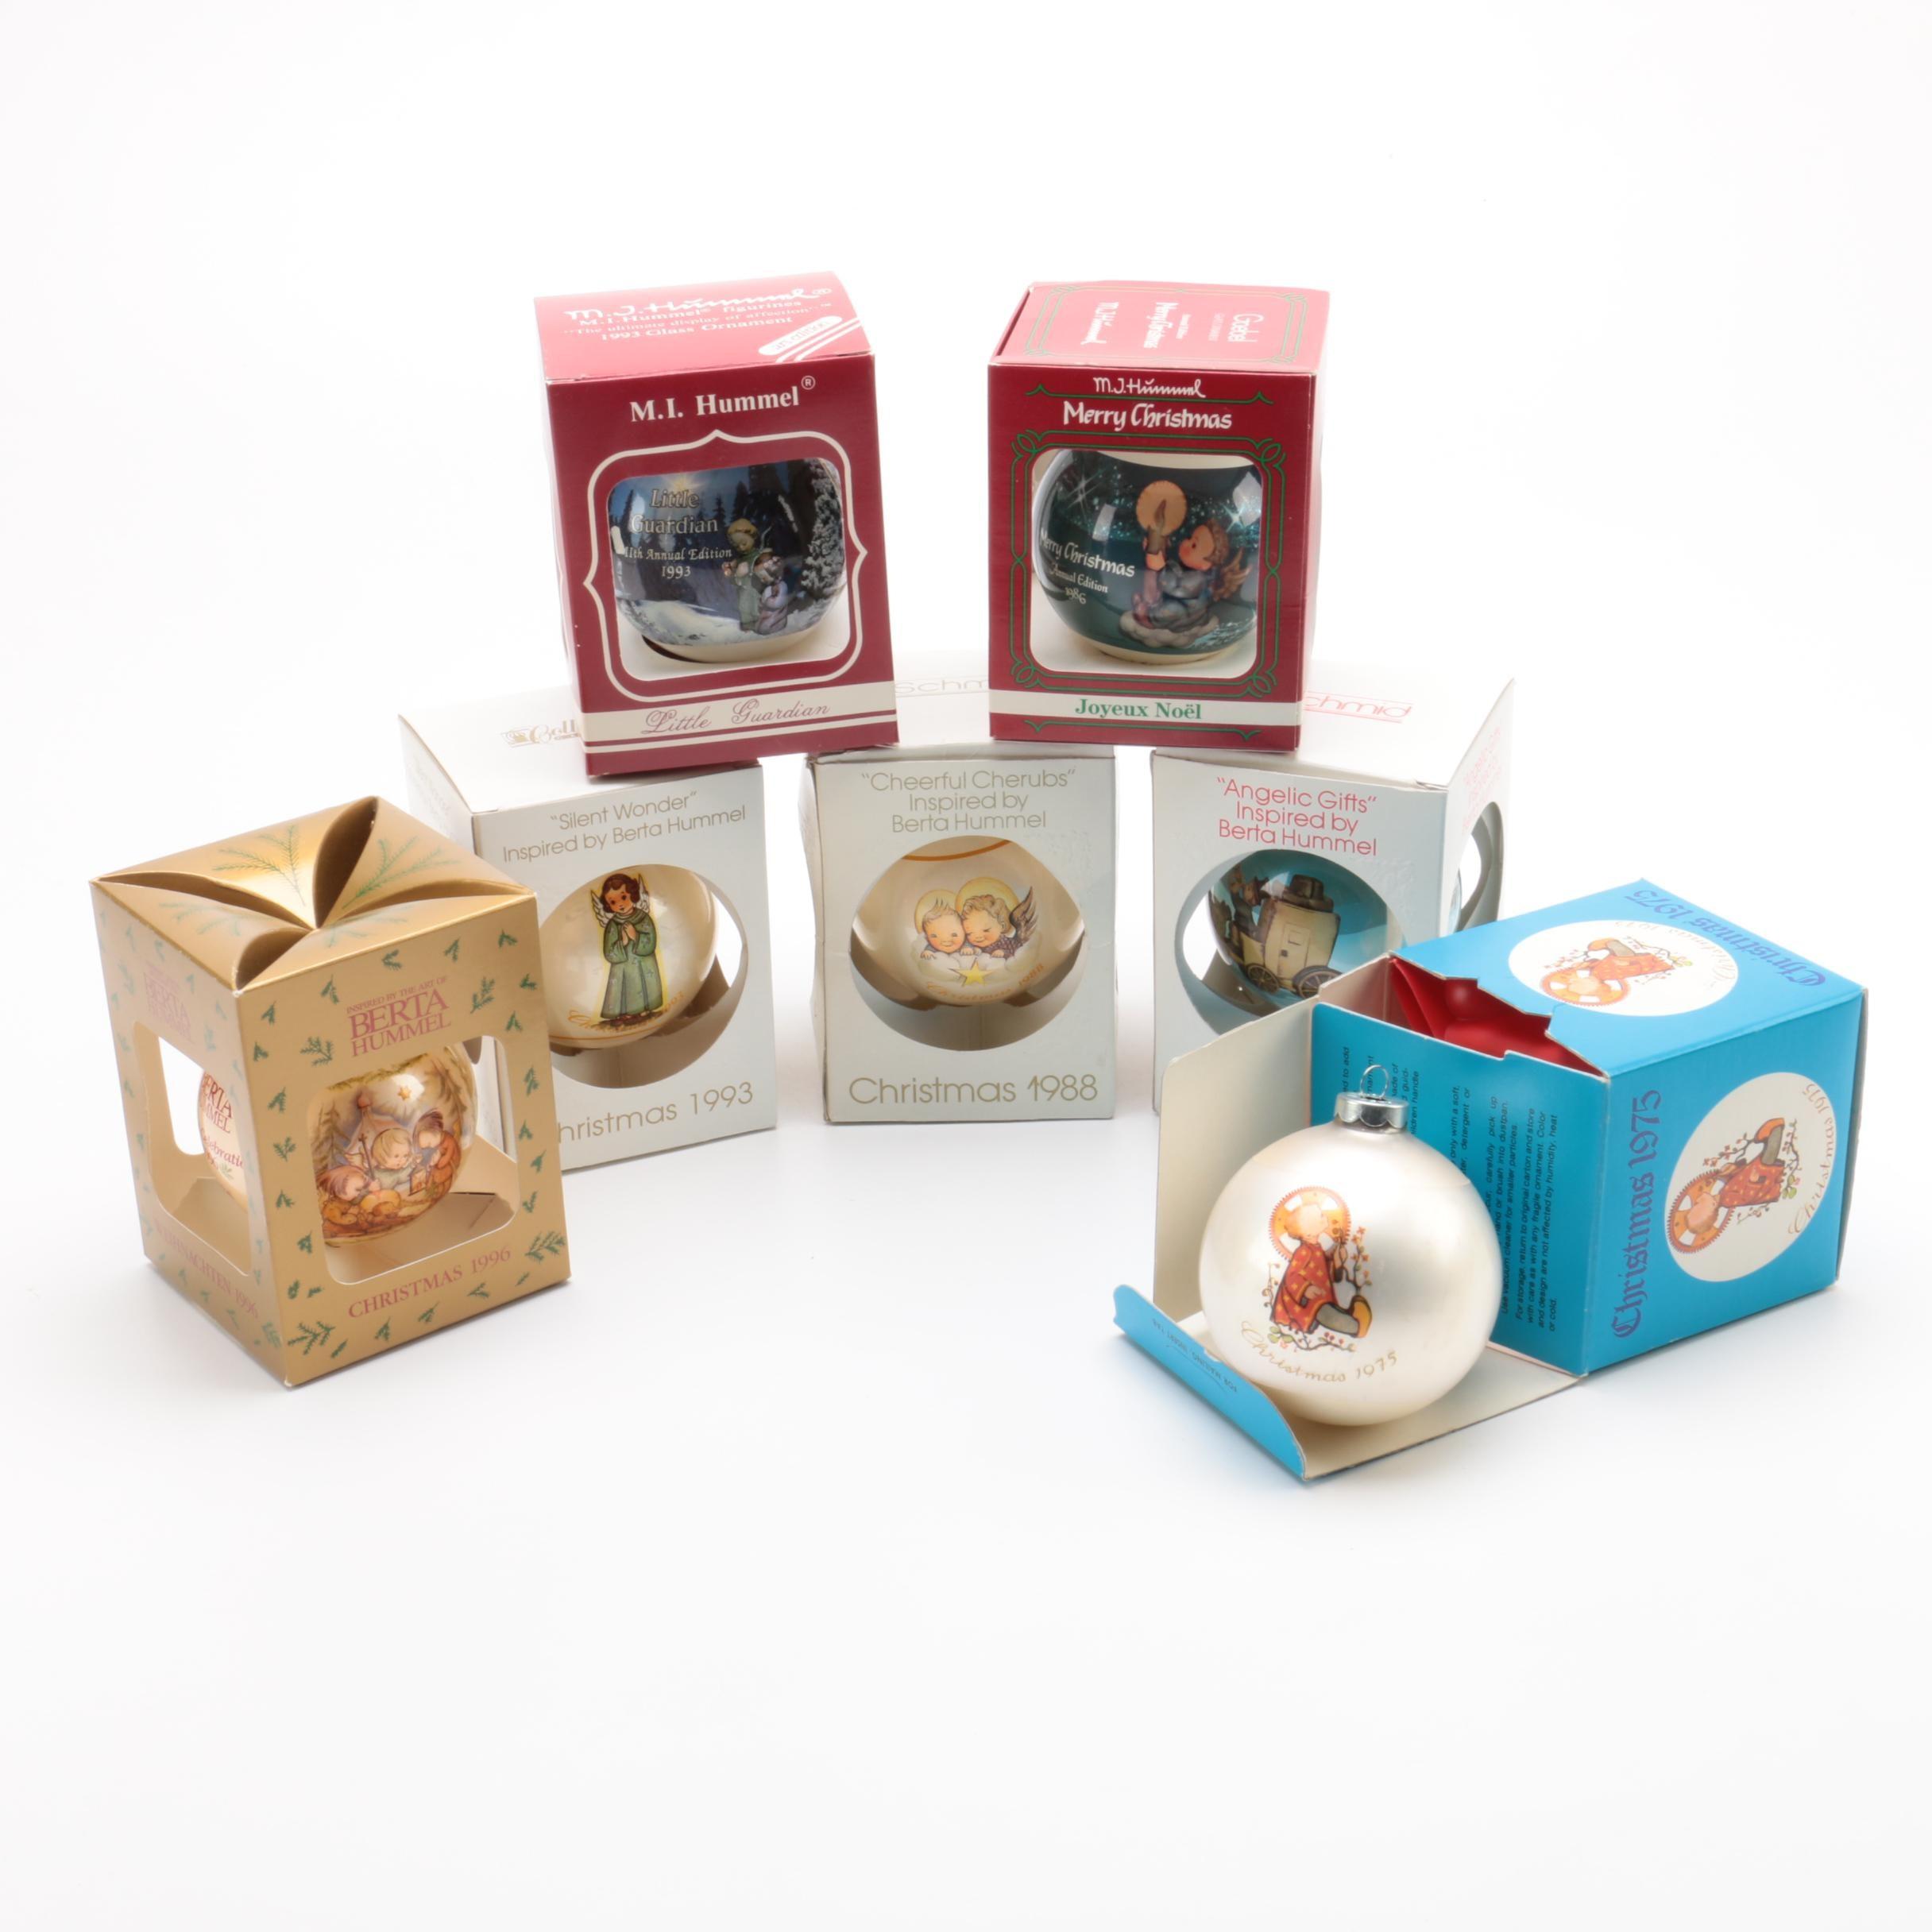 Vintage Hummel and Schmid Christmas Ornaments